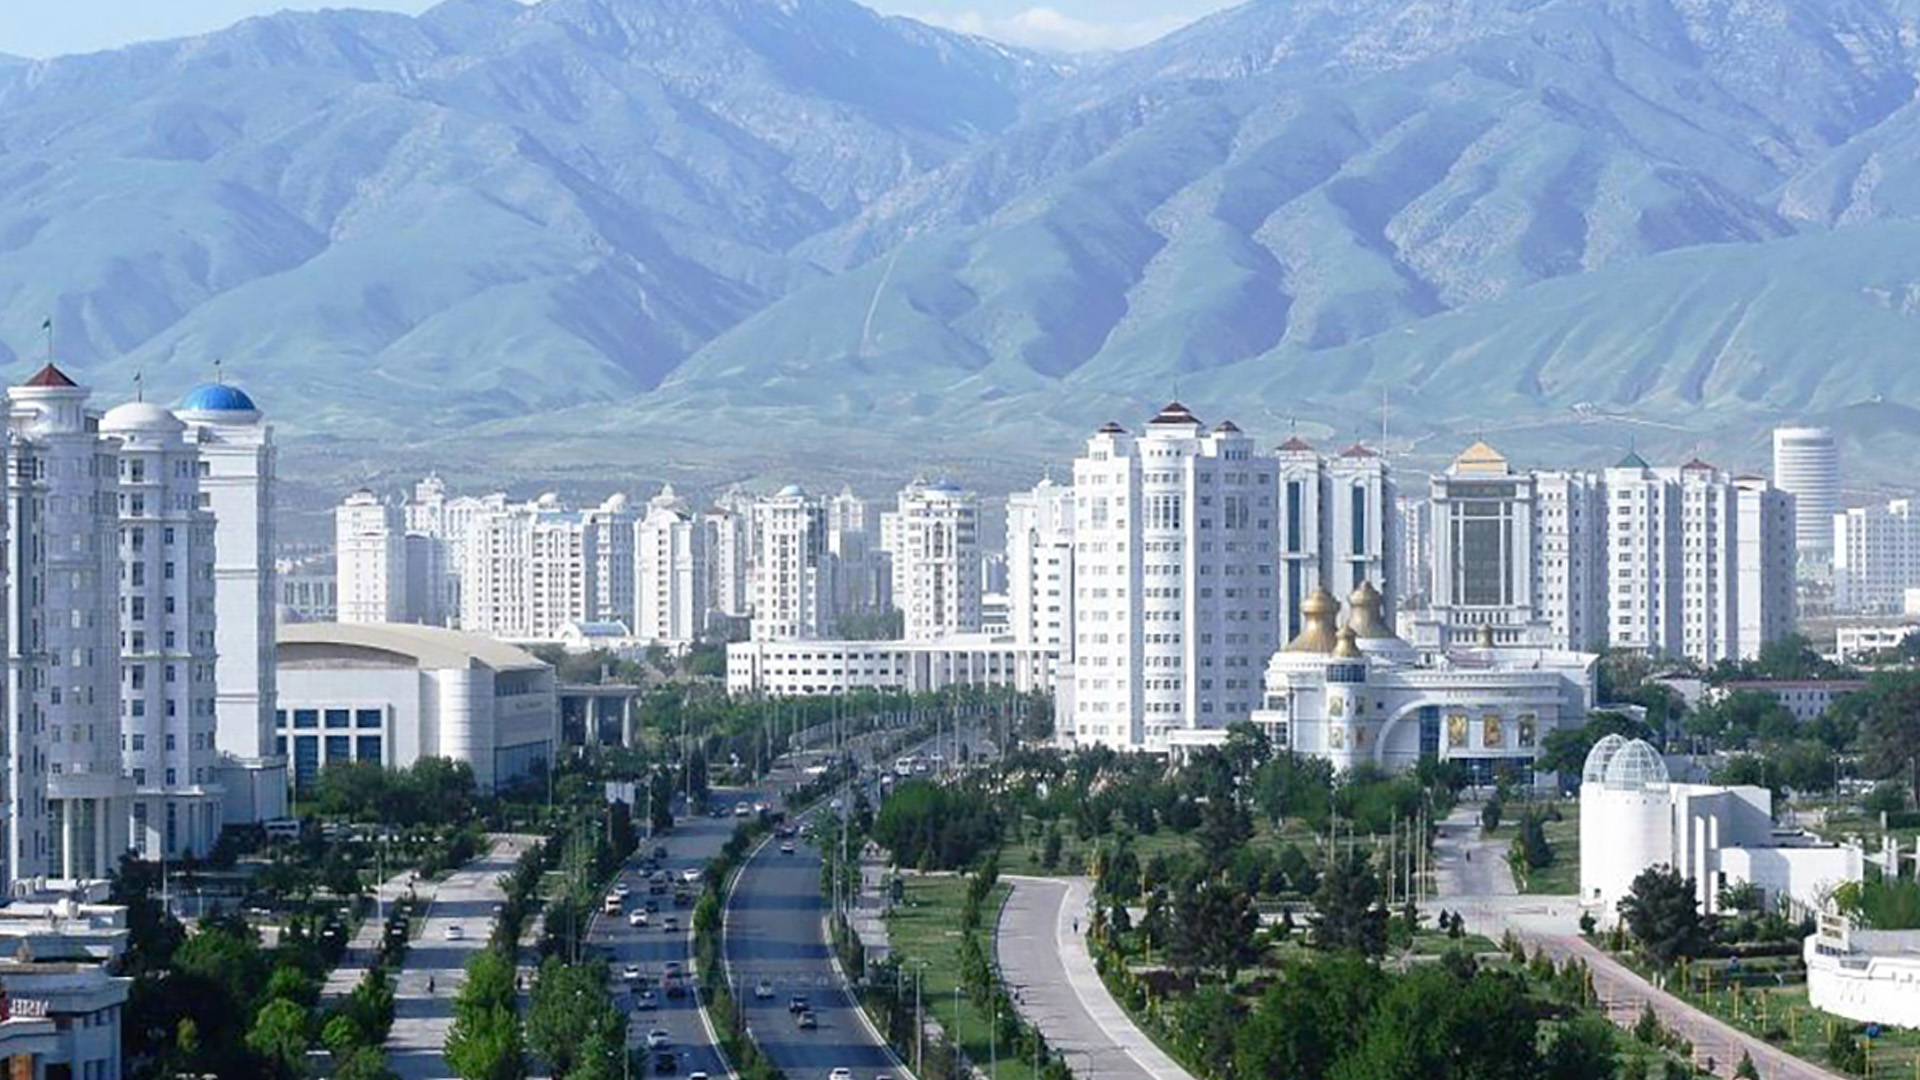 оберегала туркменистан город ашхабад фото что банки знают